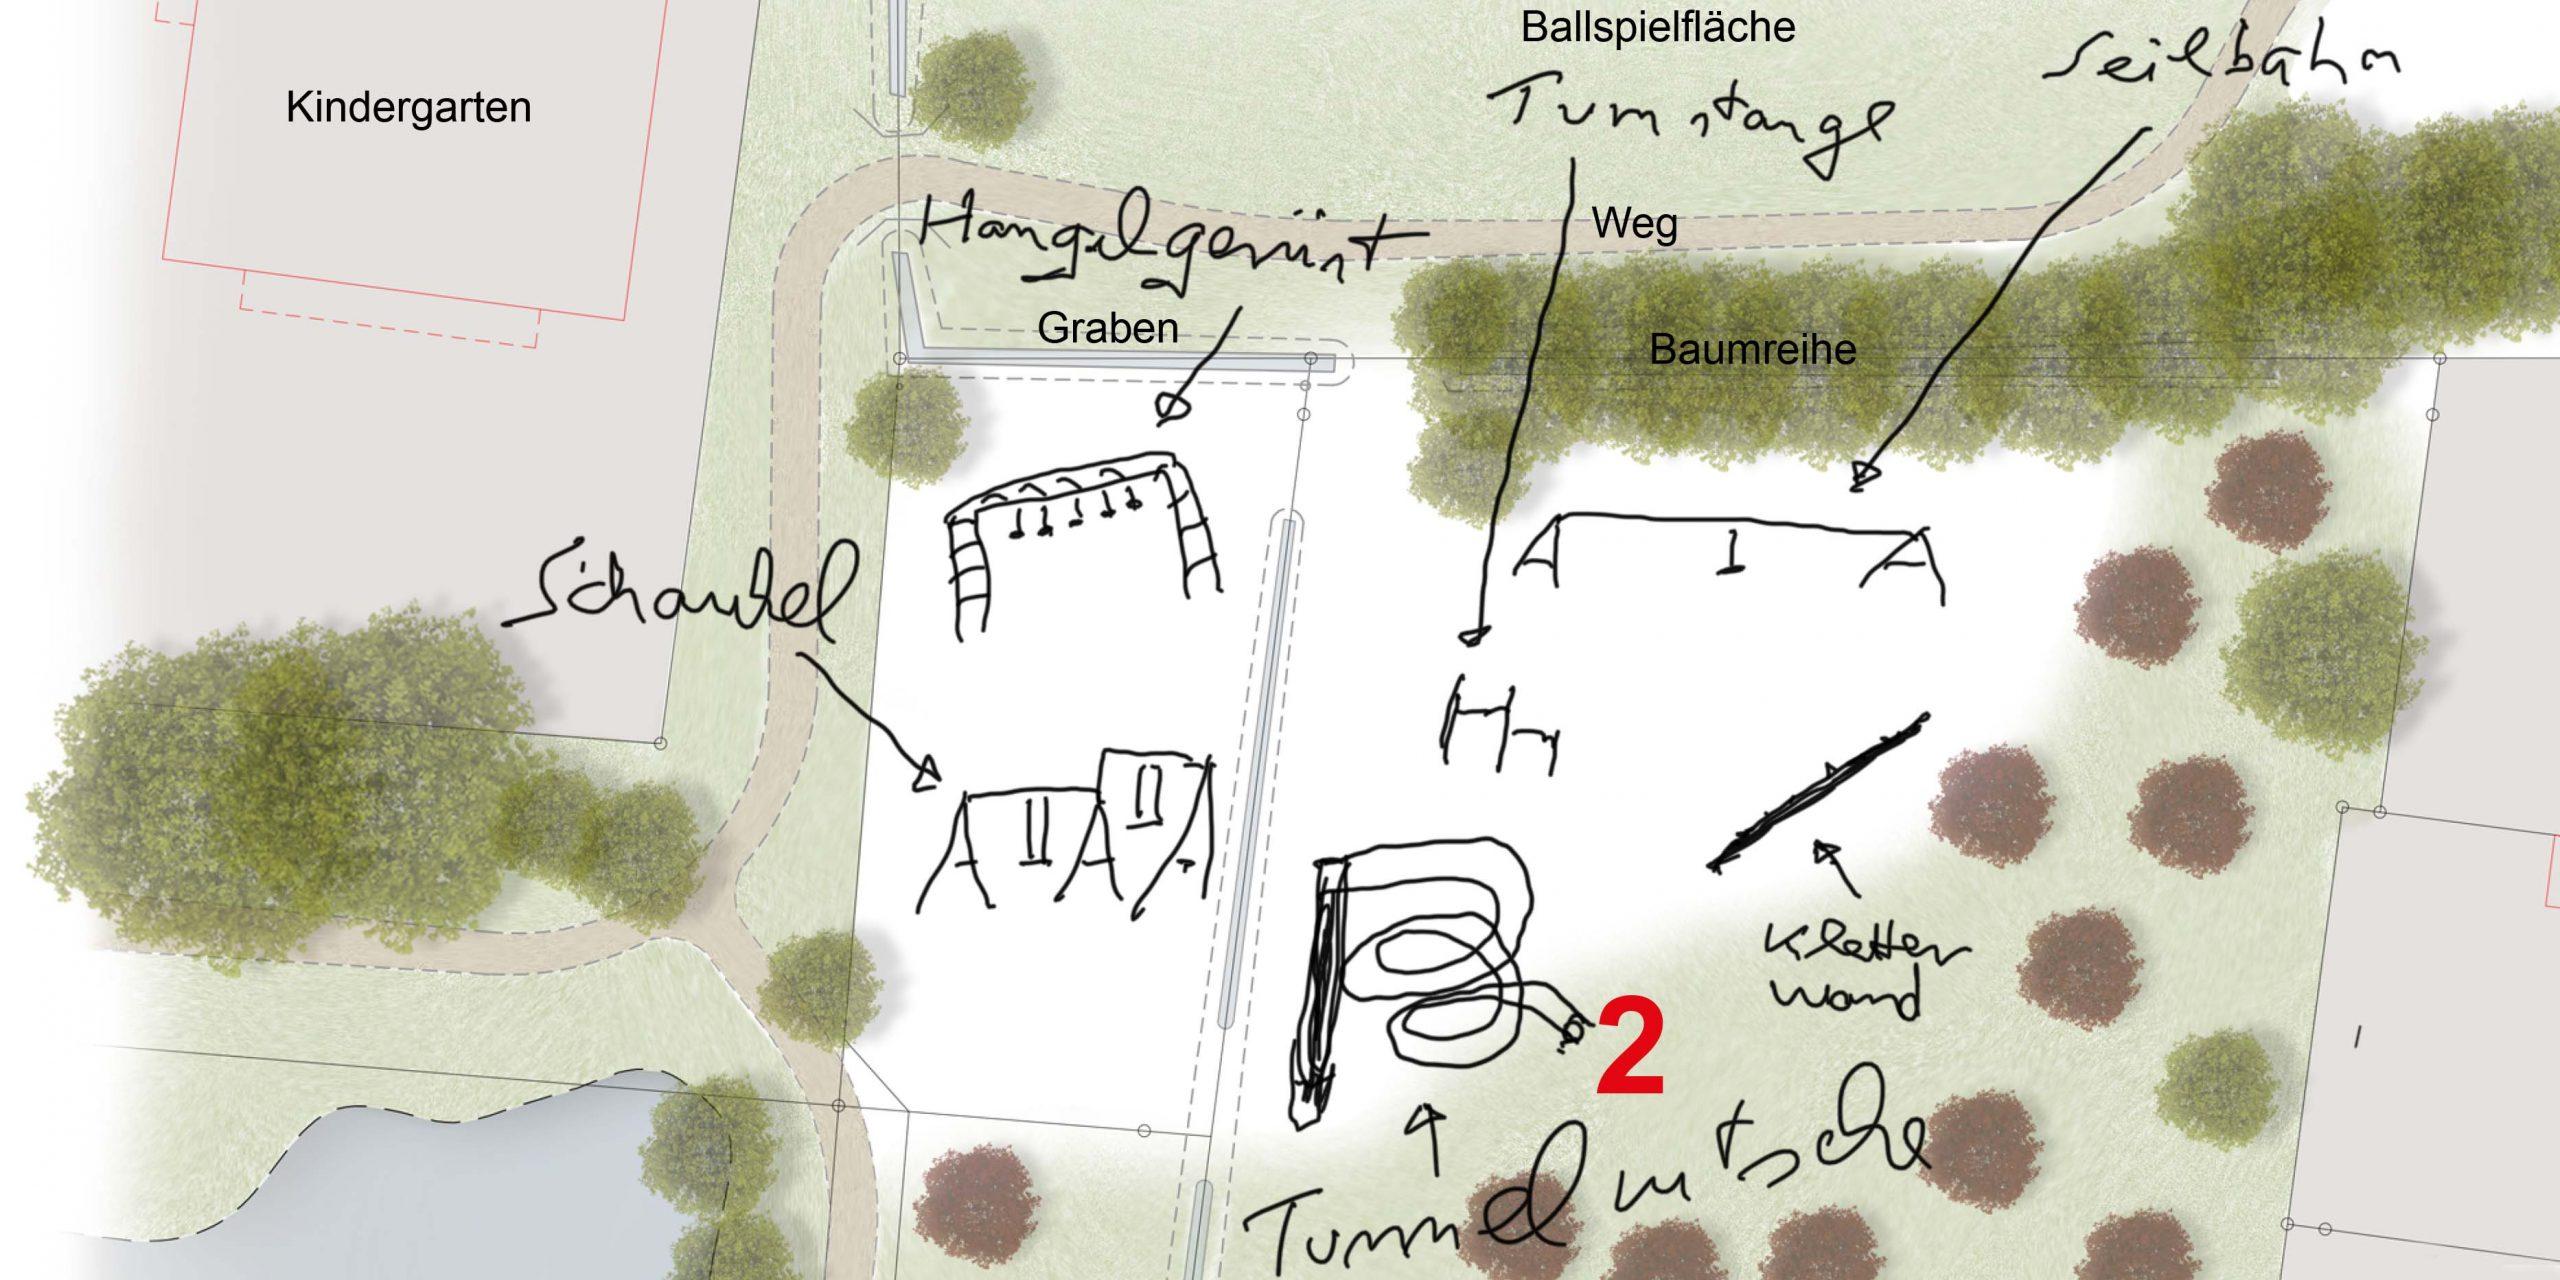 Skizze Spielplatz-Entwurf